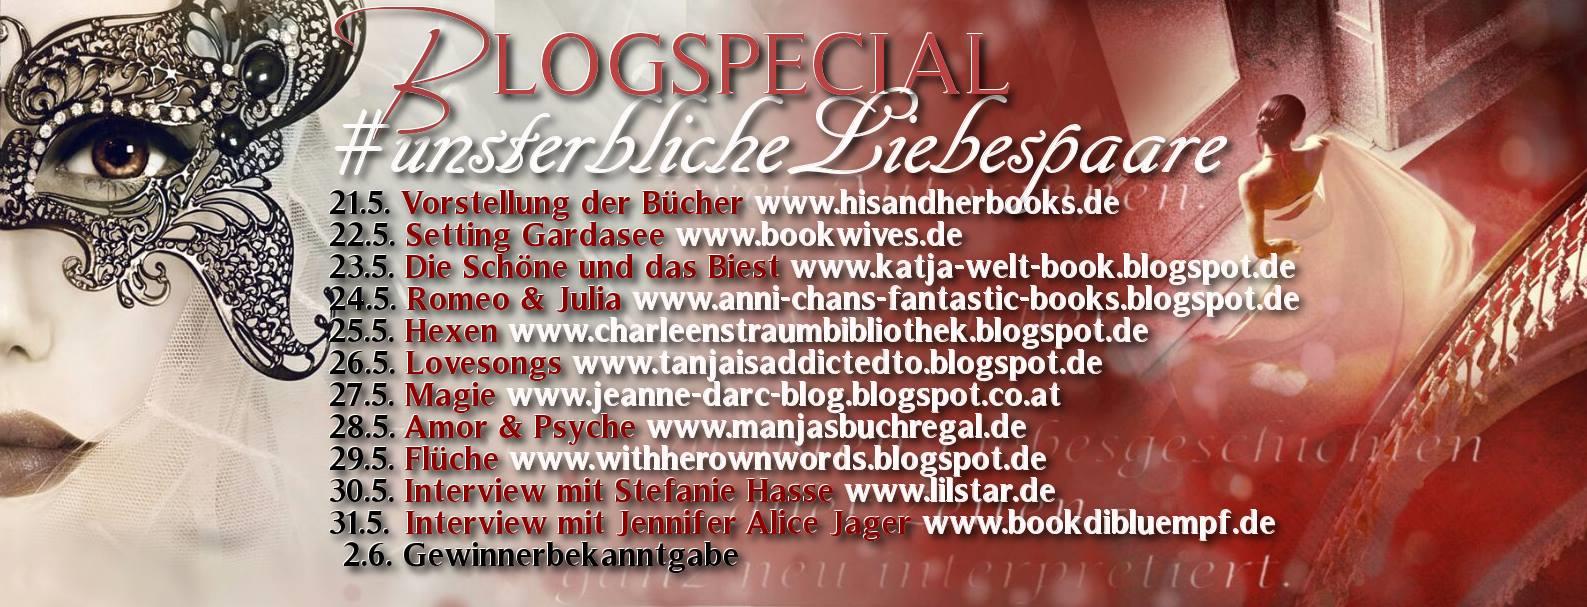 Blogtour 21.05. - 01.06.